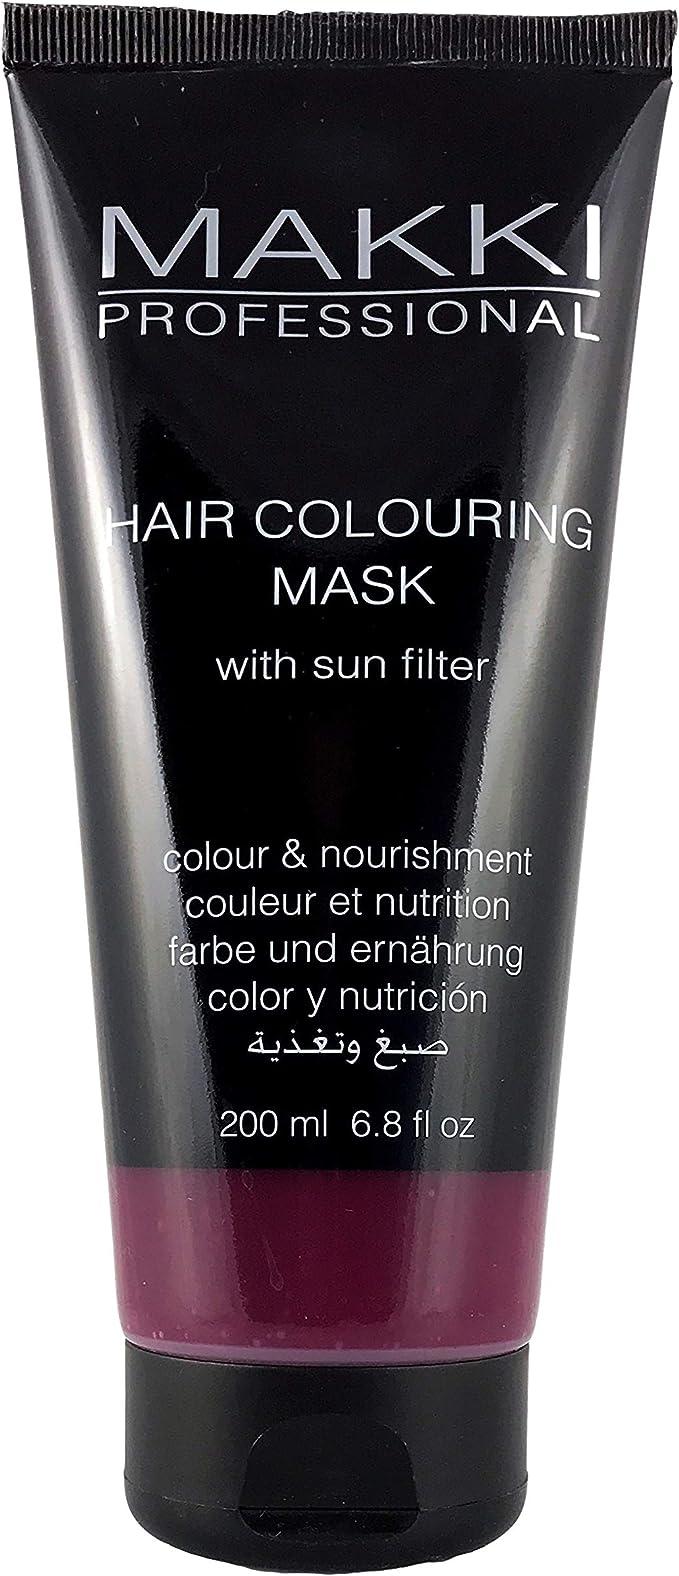 Makki Professional mascarilla de tinte semi permanente para cabello